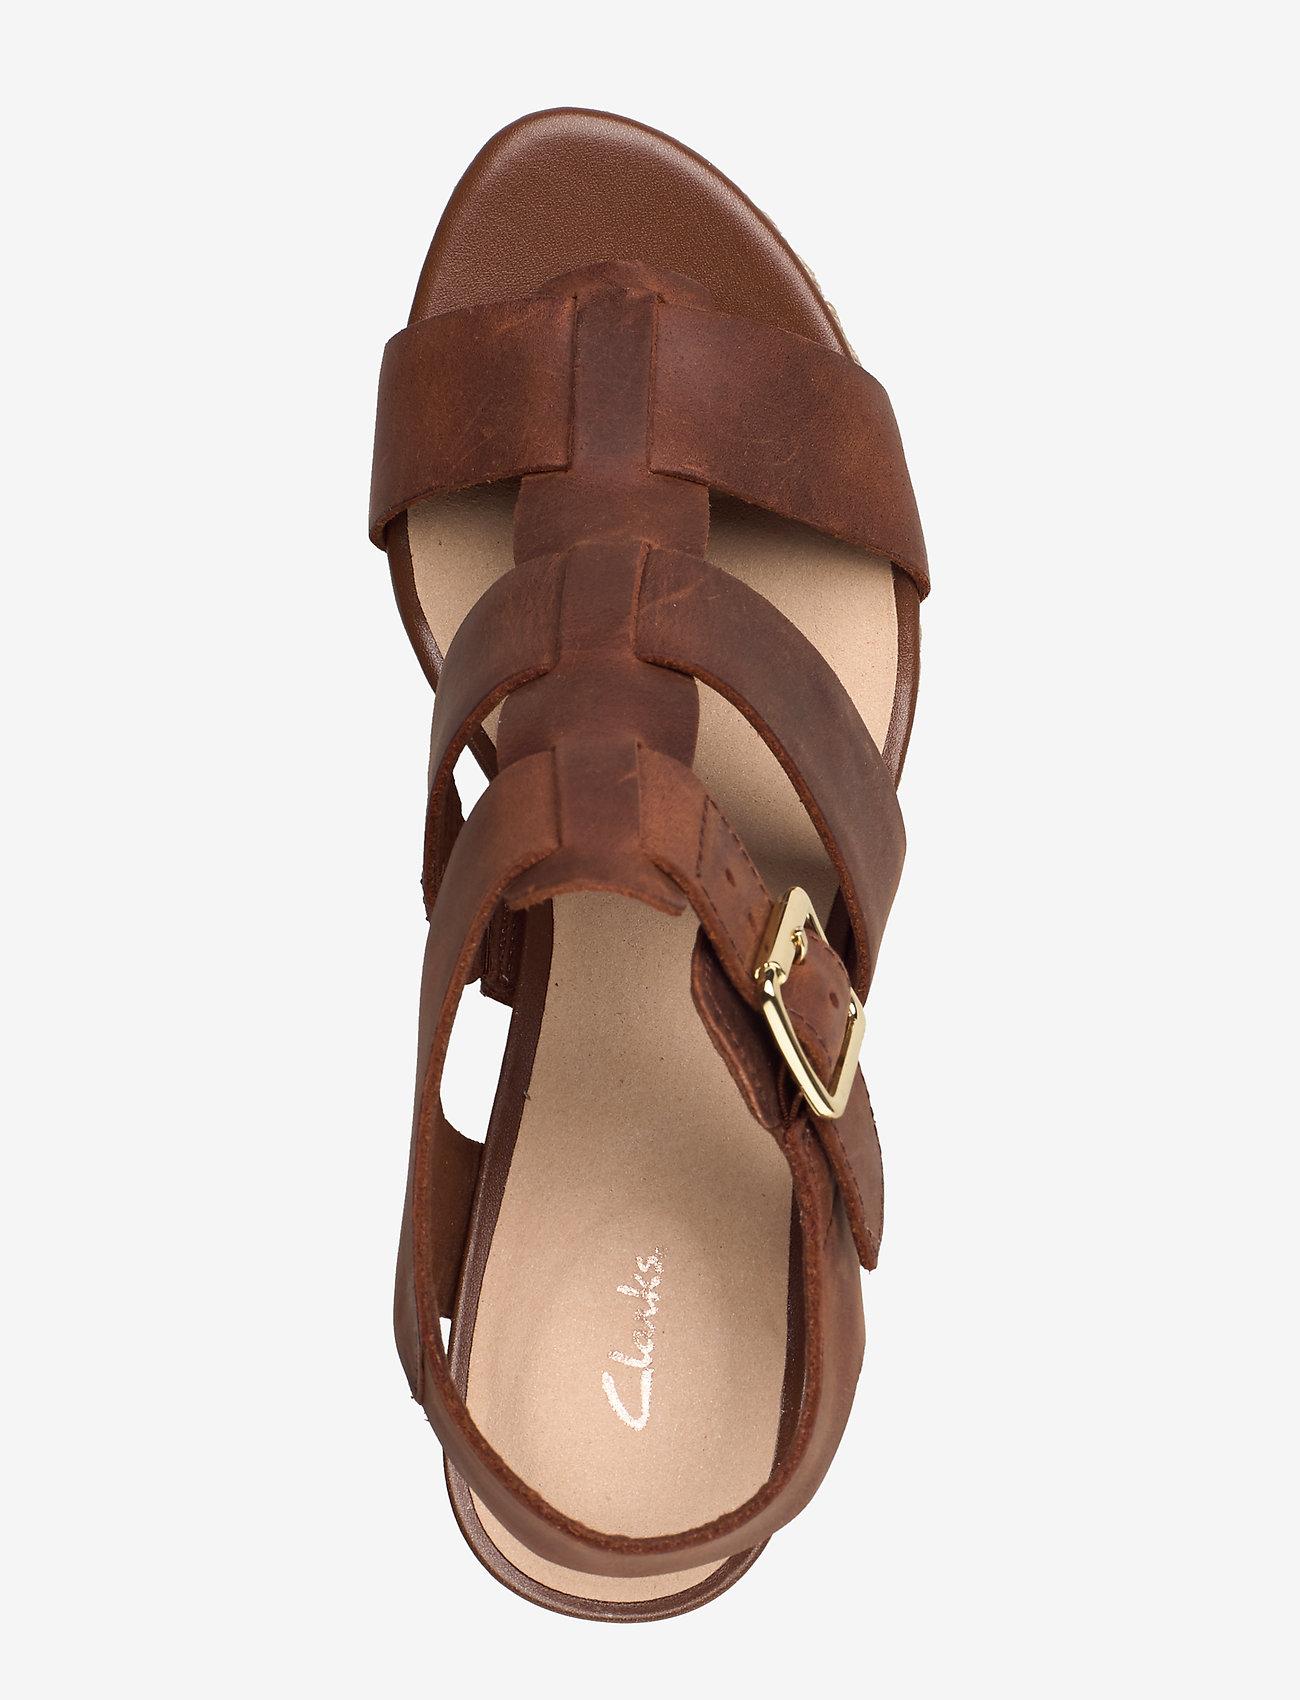 Maritsa95 Glad (Tan Leather) - Clarks